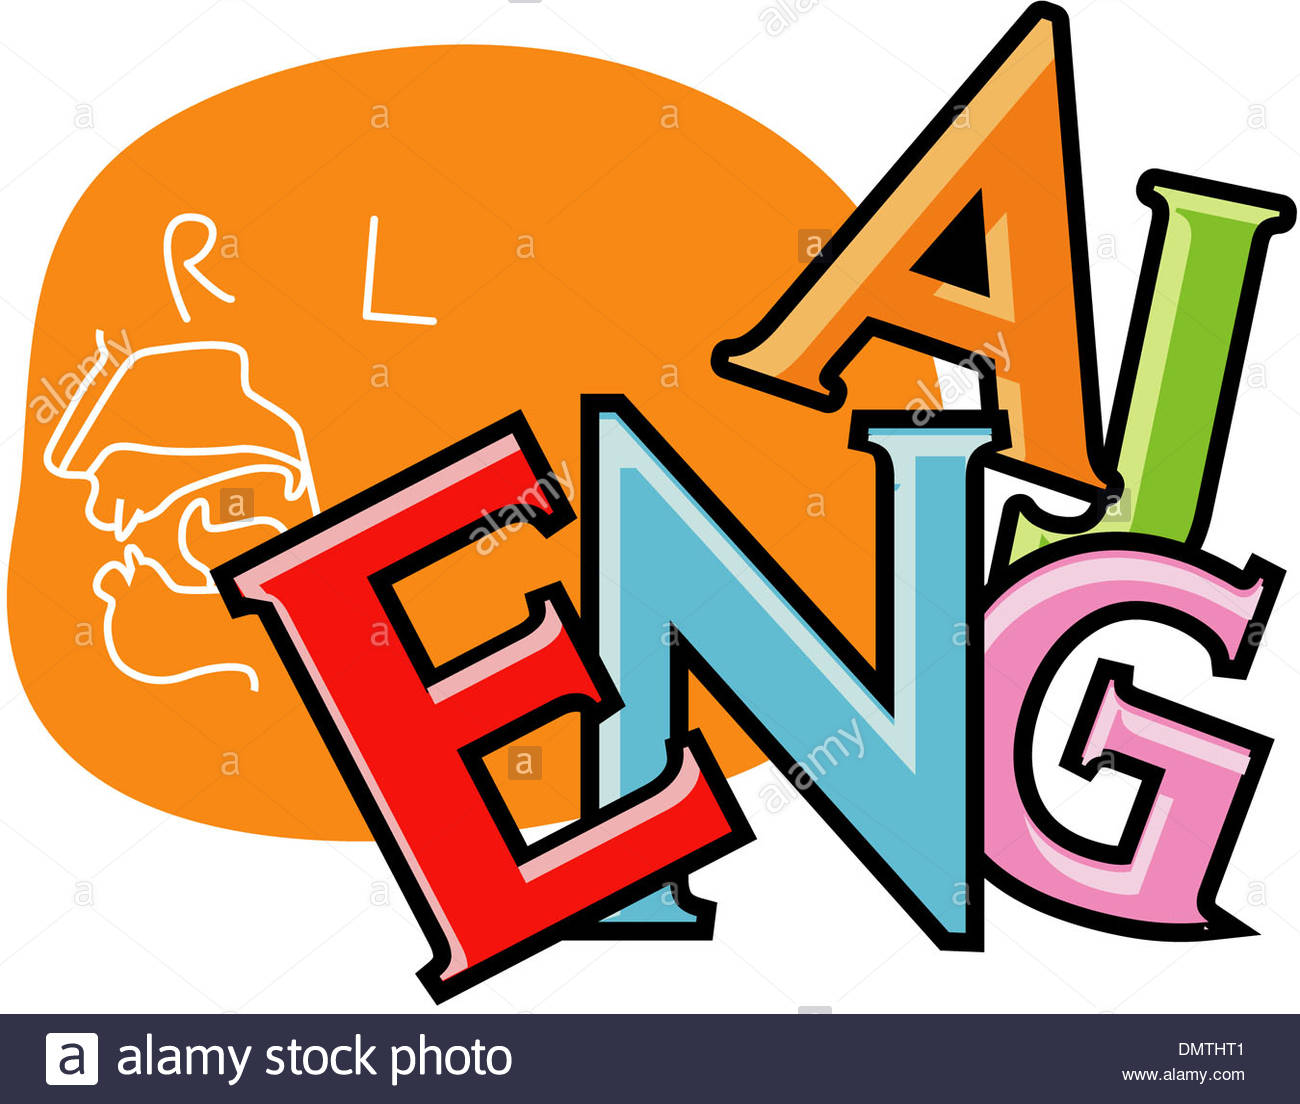 Worksheet Alphabet Sentence icon english character alphabet letter sentence stock photo sentence